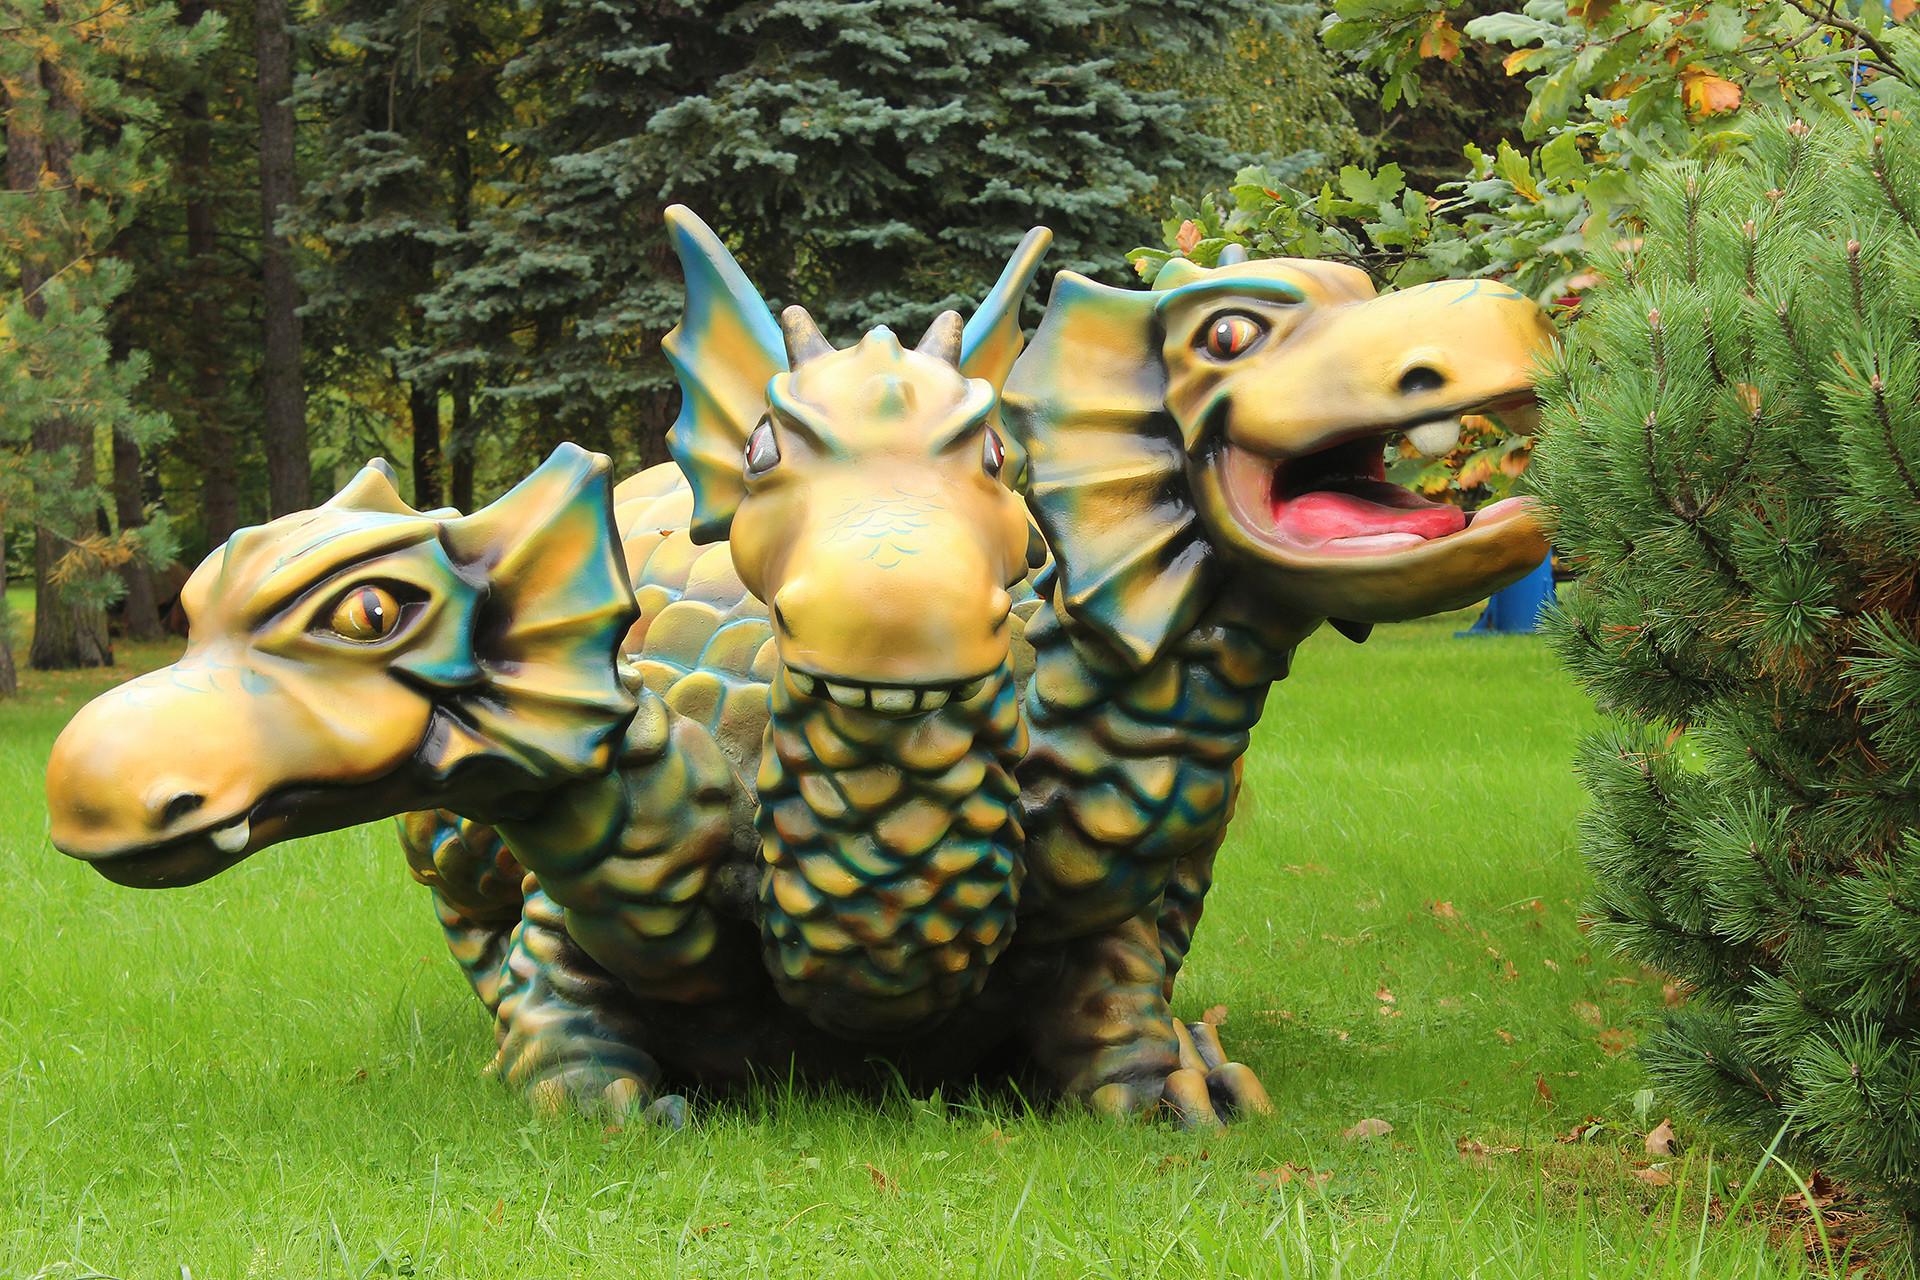 Patung Zmey Gorynych di taman Divo-Ostro, Sankt Peterburg.